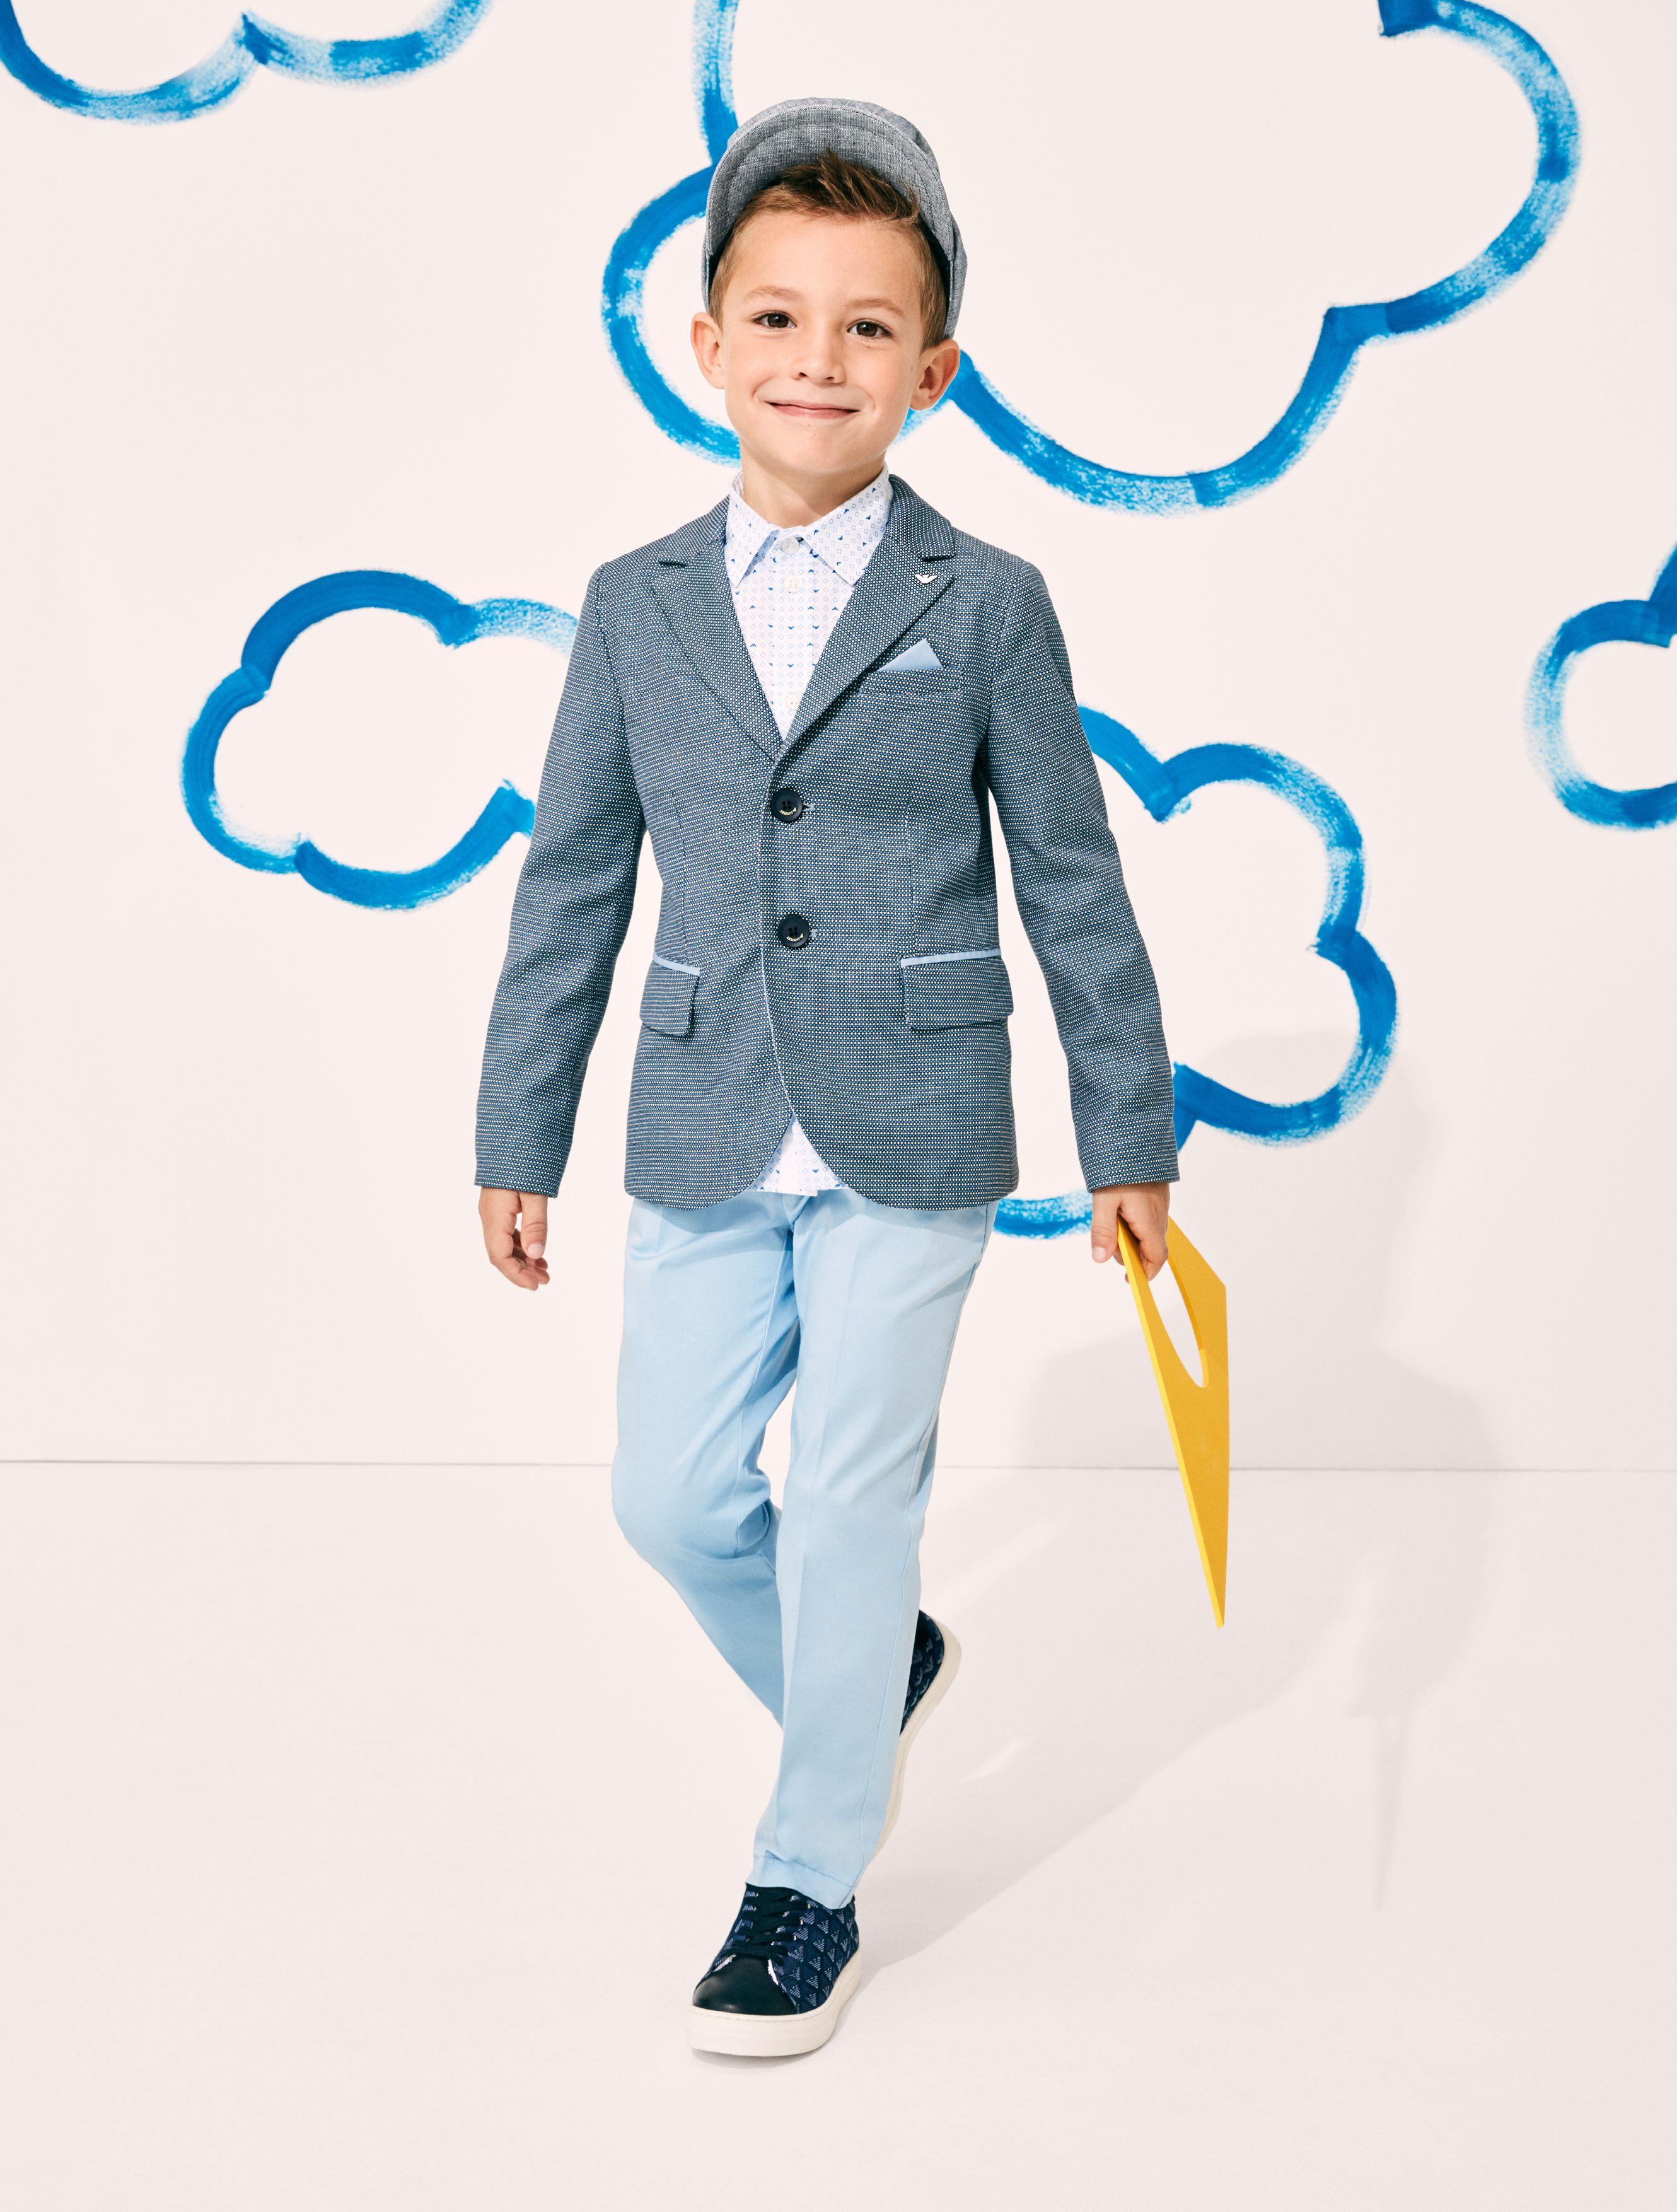 b59520adafd1 Spring Summer 2018 Advertising Campaign  ArmaniJunior Armani Kids